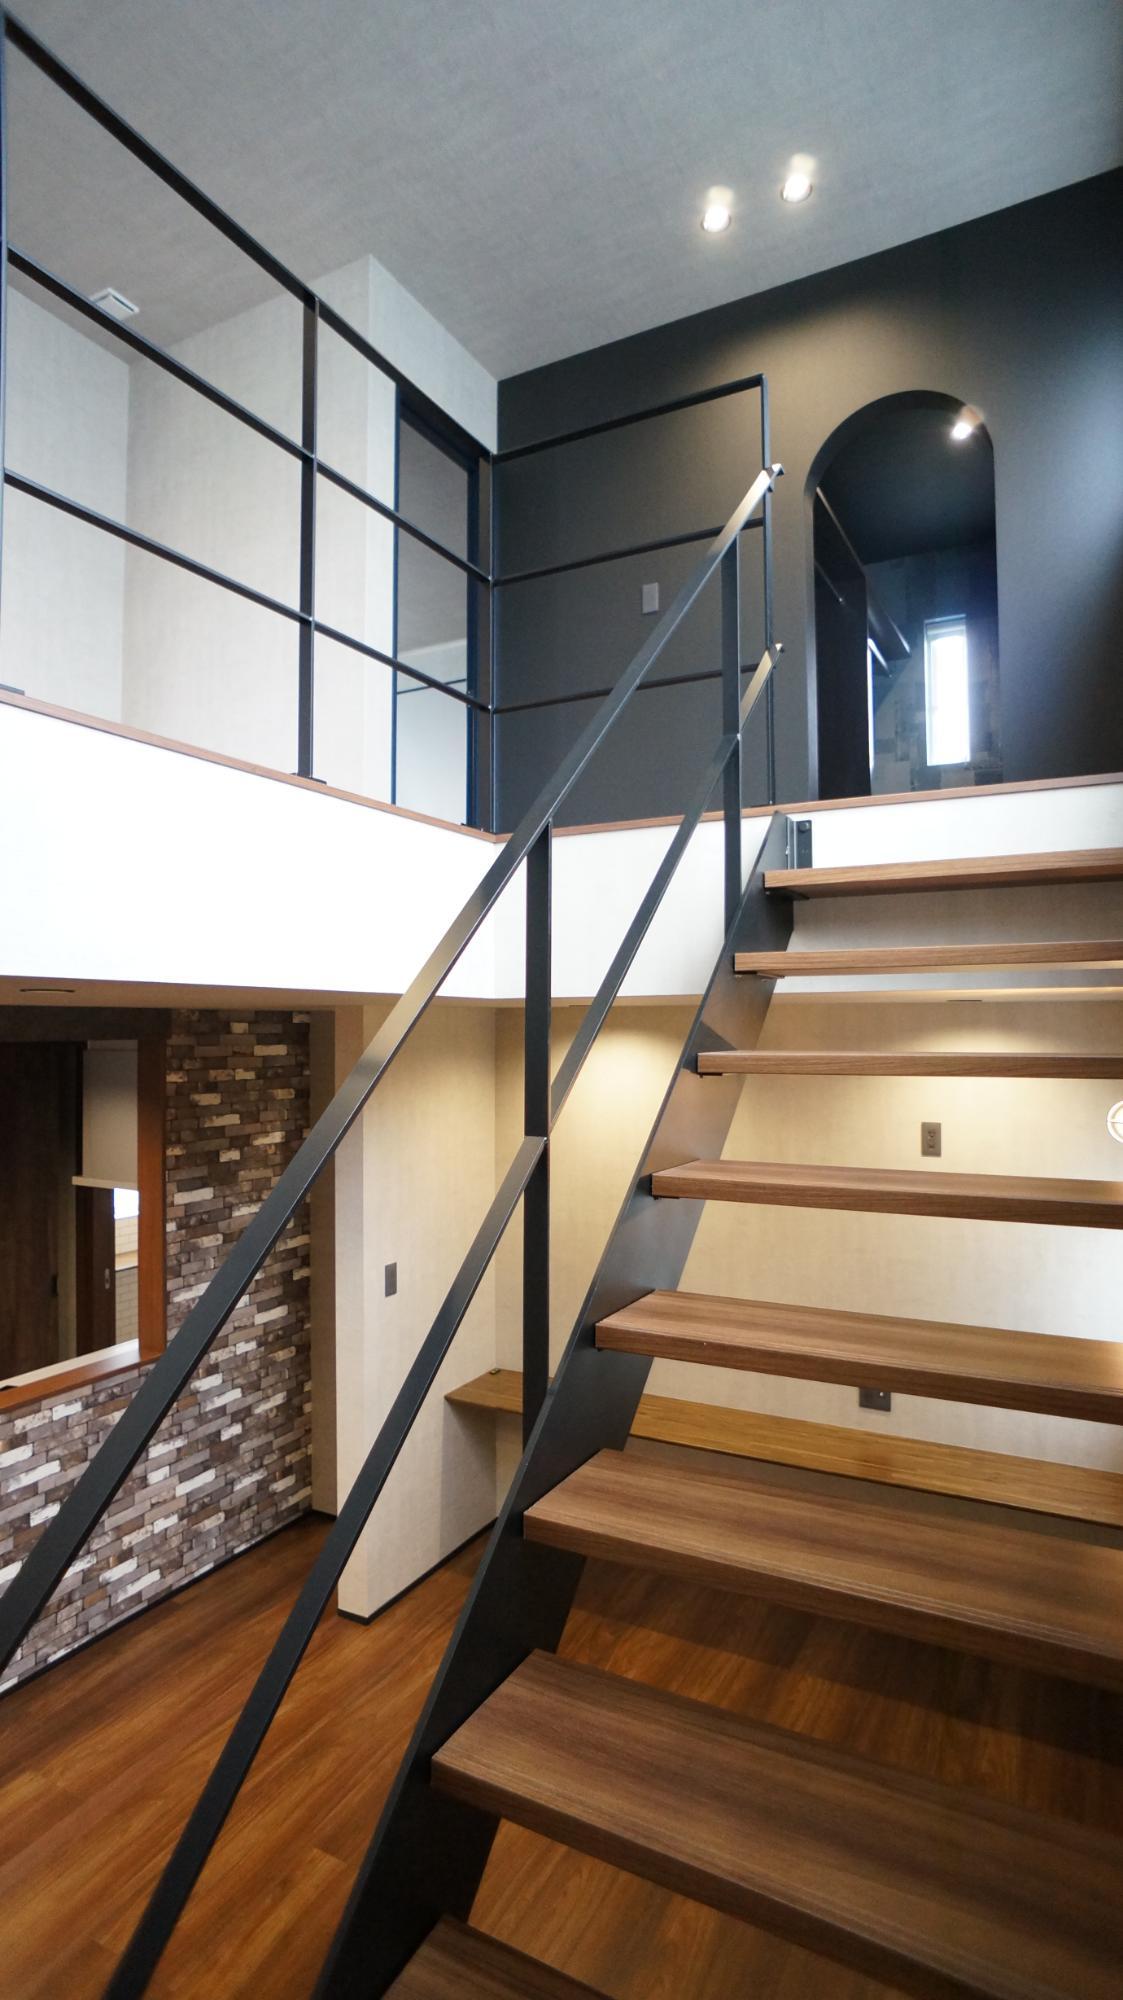 H.FACTORY/株式会社 橋本技建「吹き抜けのあるインダストリアルの家」の階段の実例写真